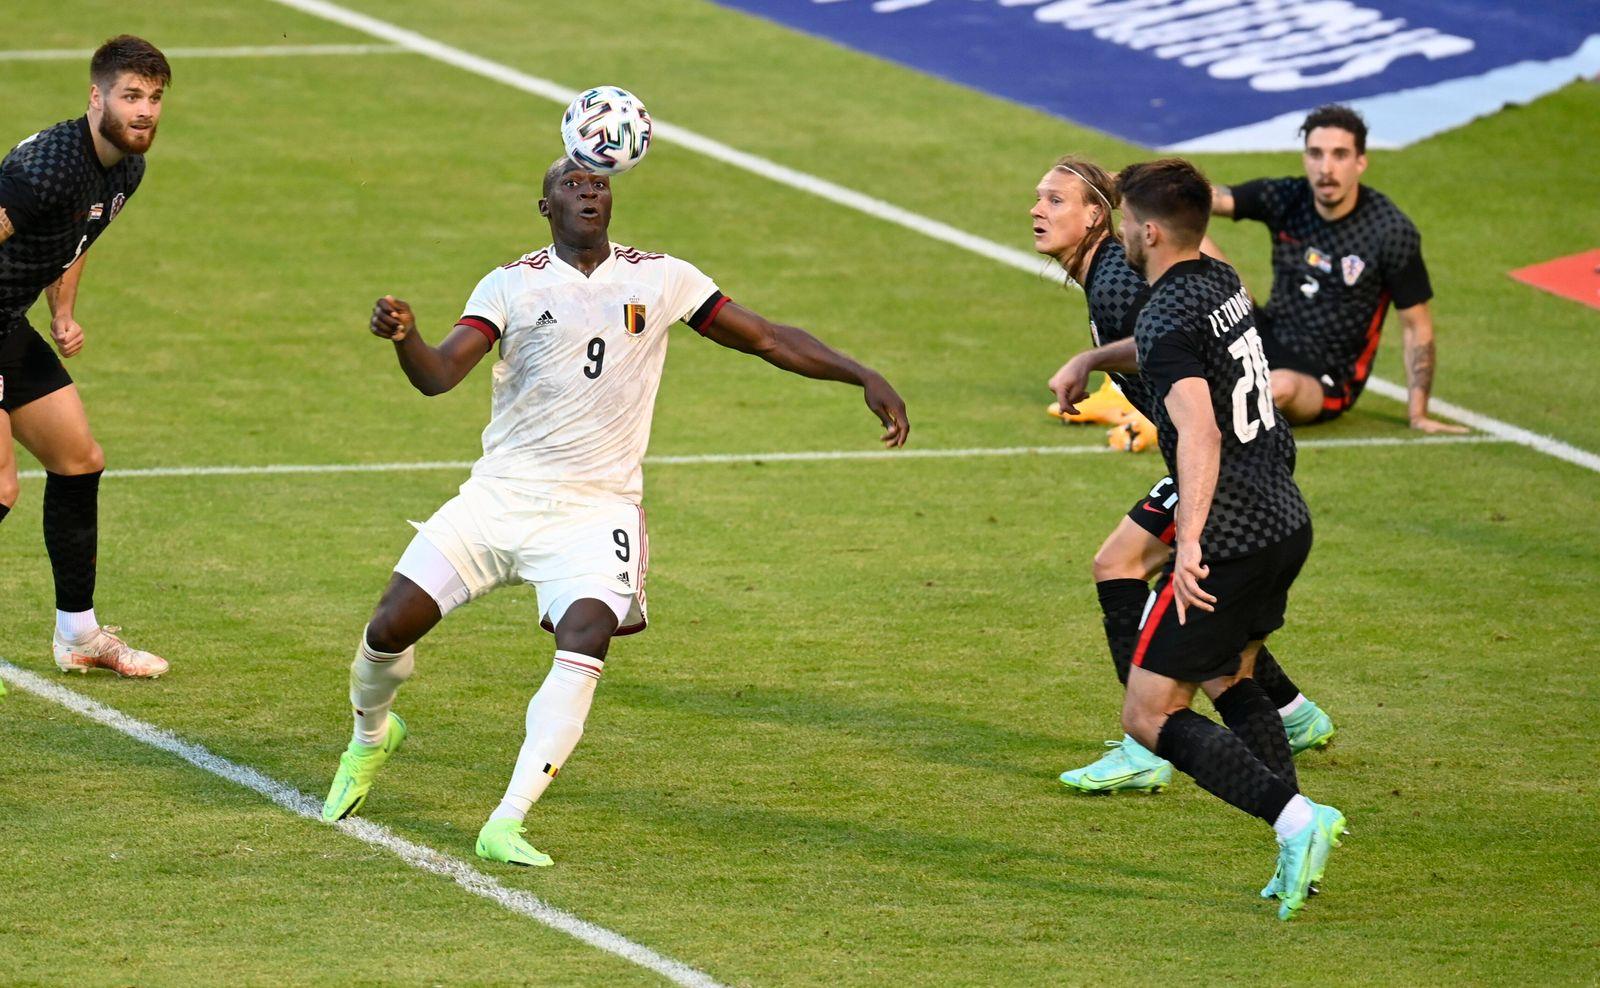 BRUSSELS, BELGIUM - JUNE 06 : Romelu Lukaku forward of Belgium celebrates after scoring during a FIFA International Frie